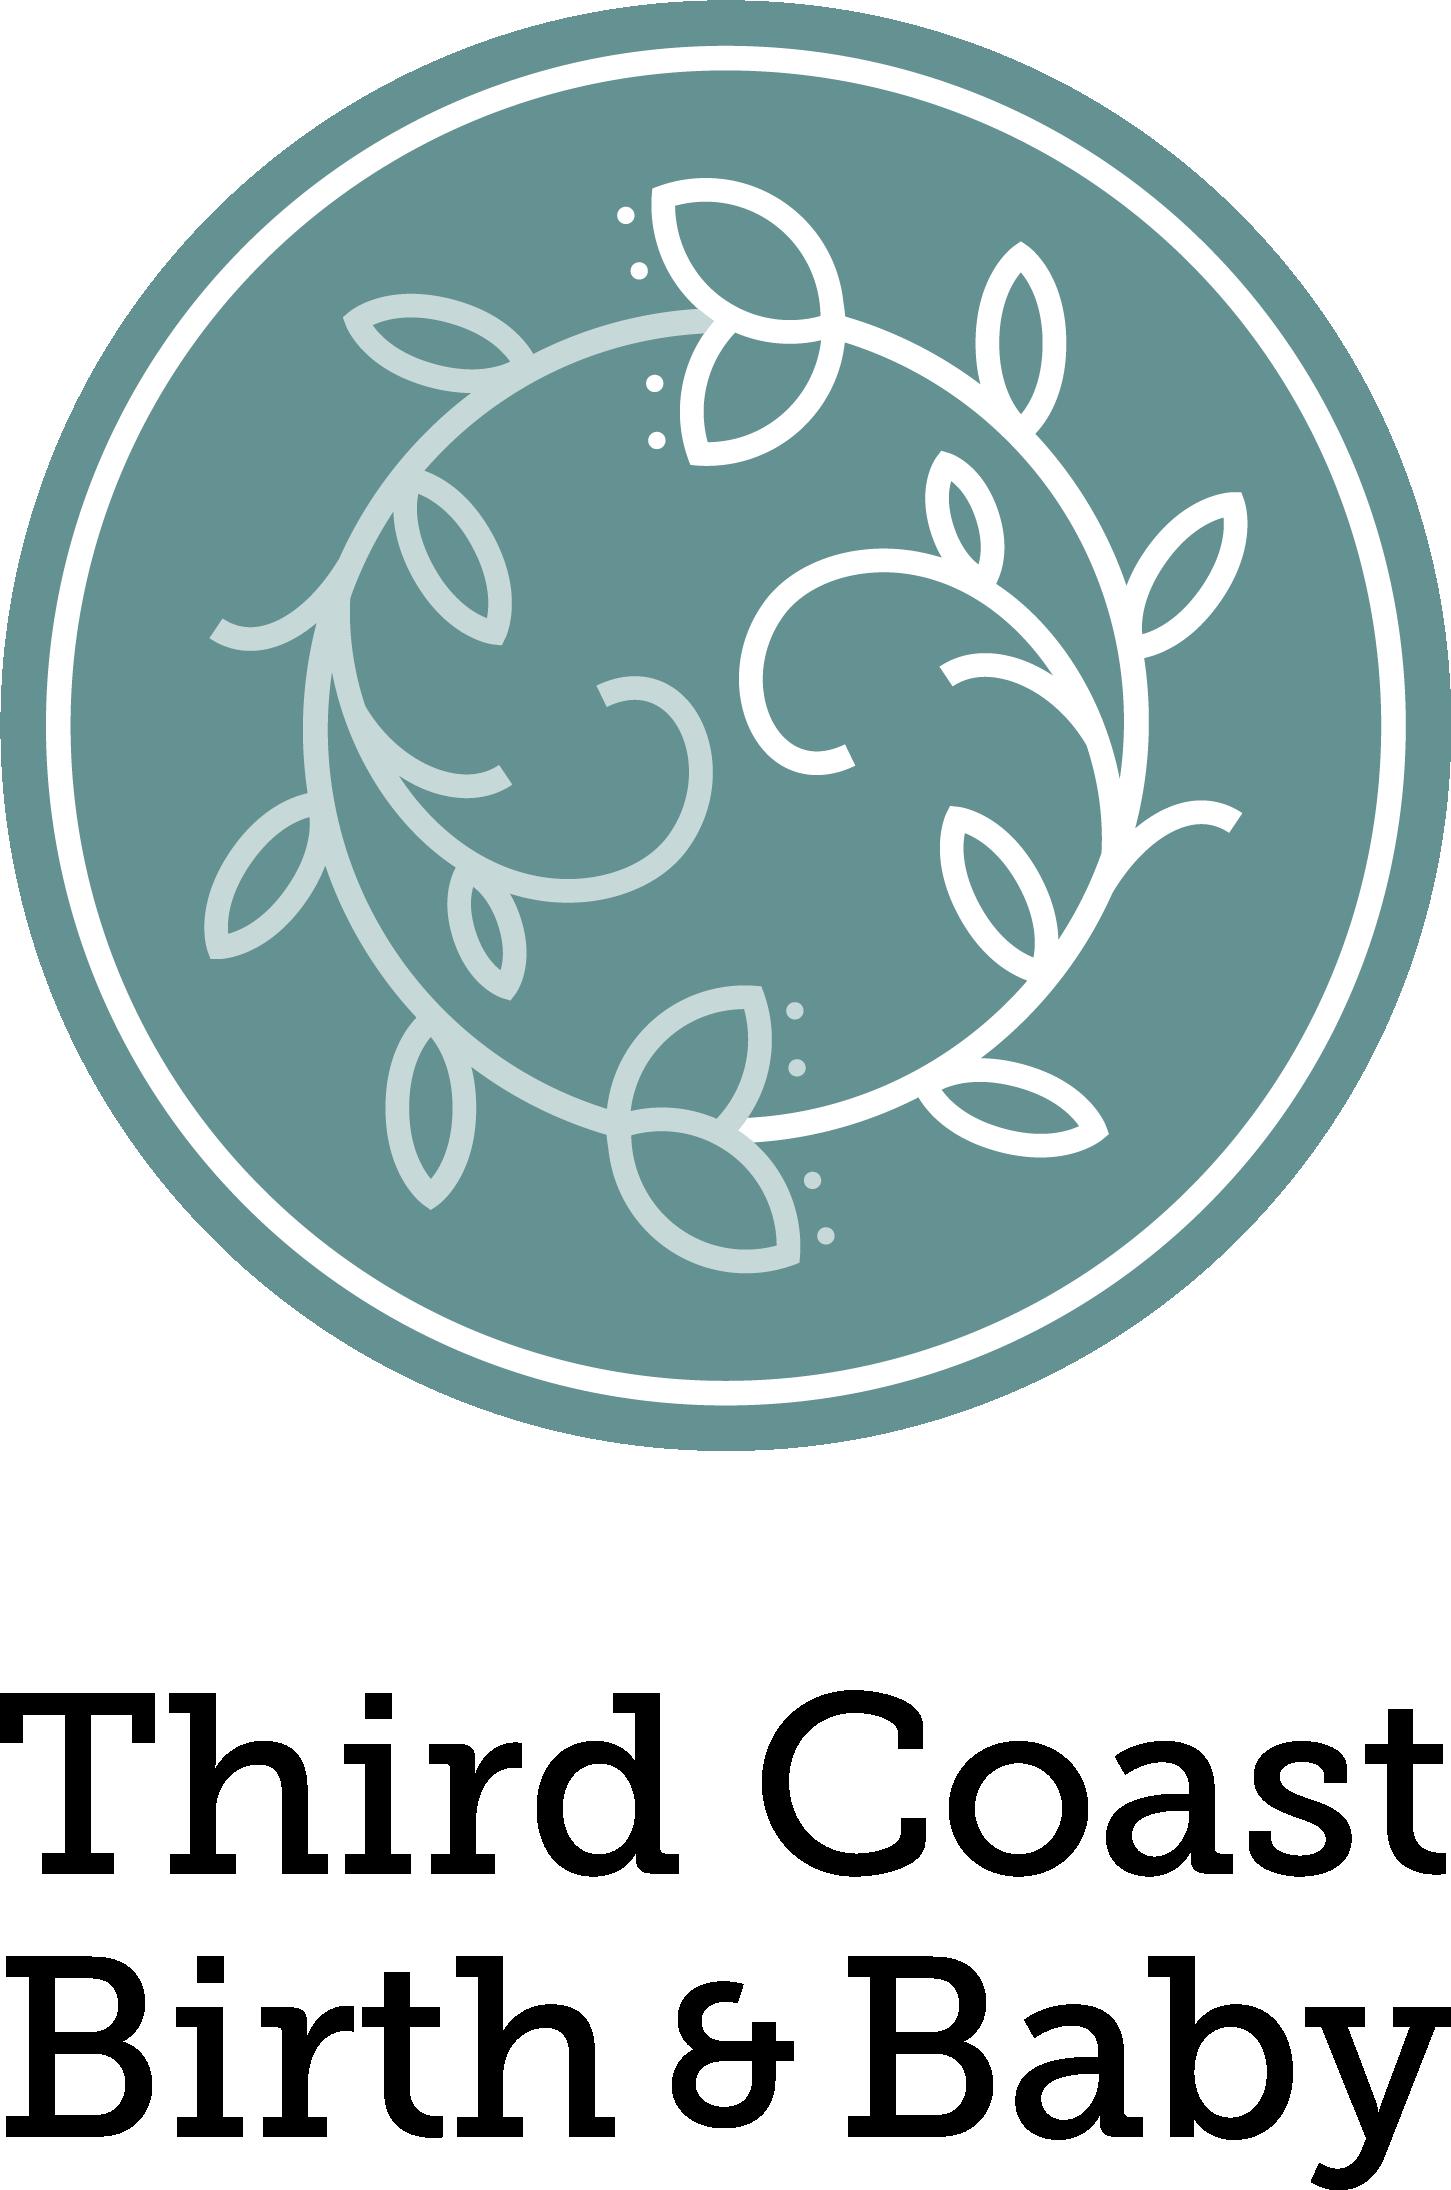 Third Coast Birth & Baby